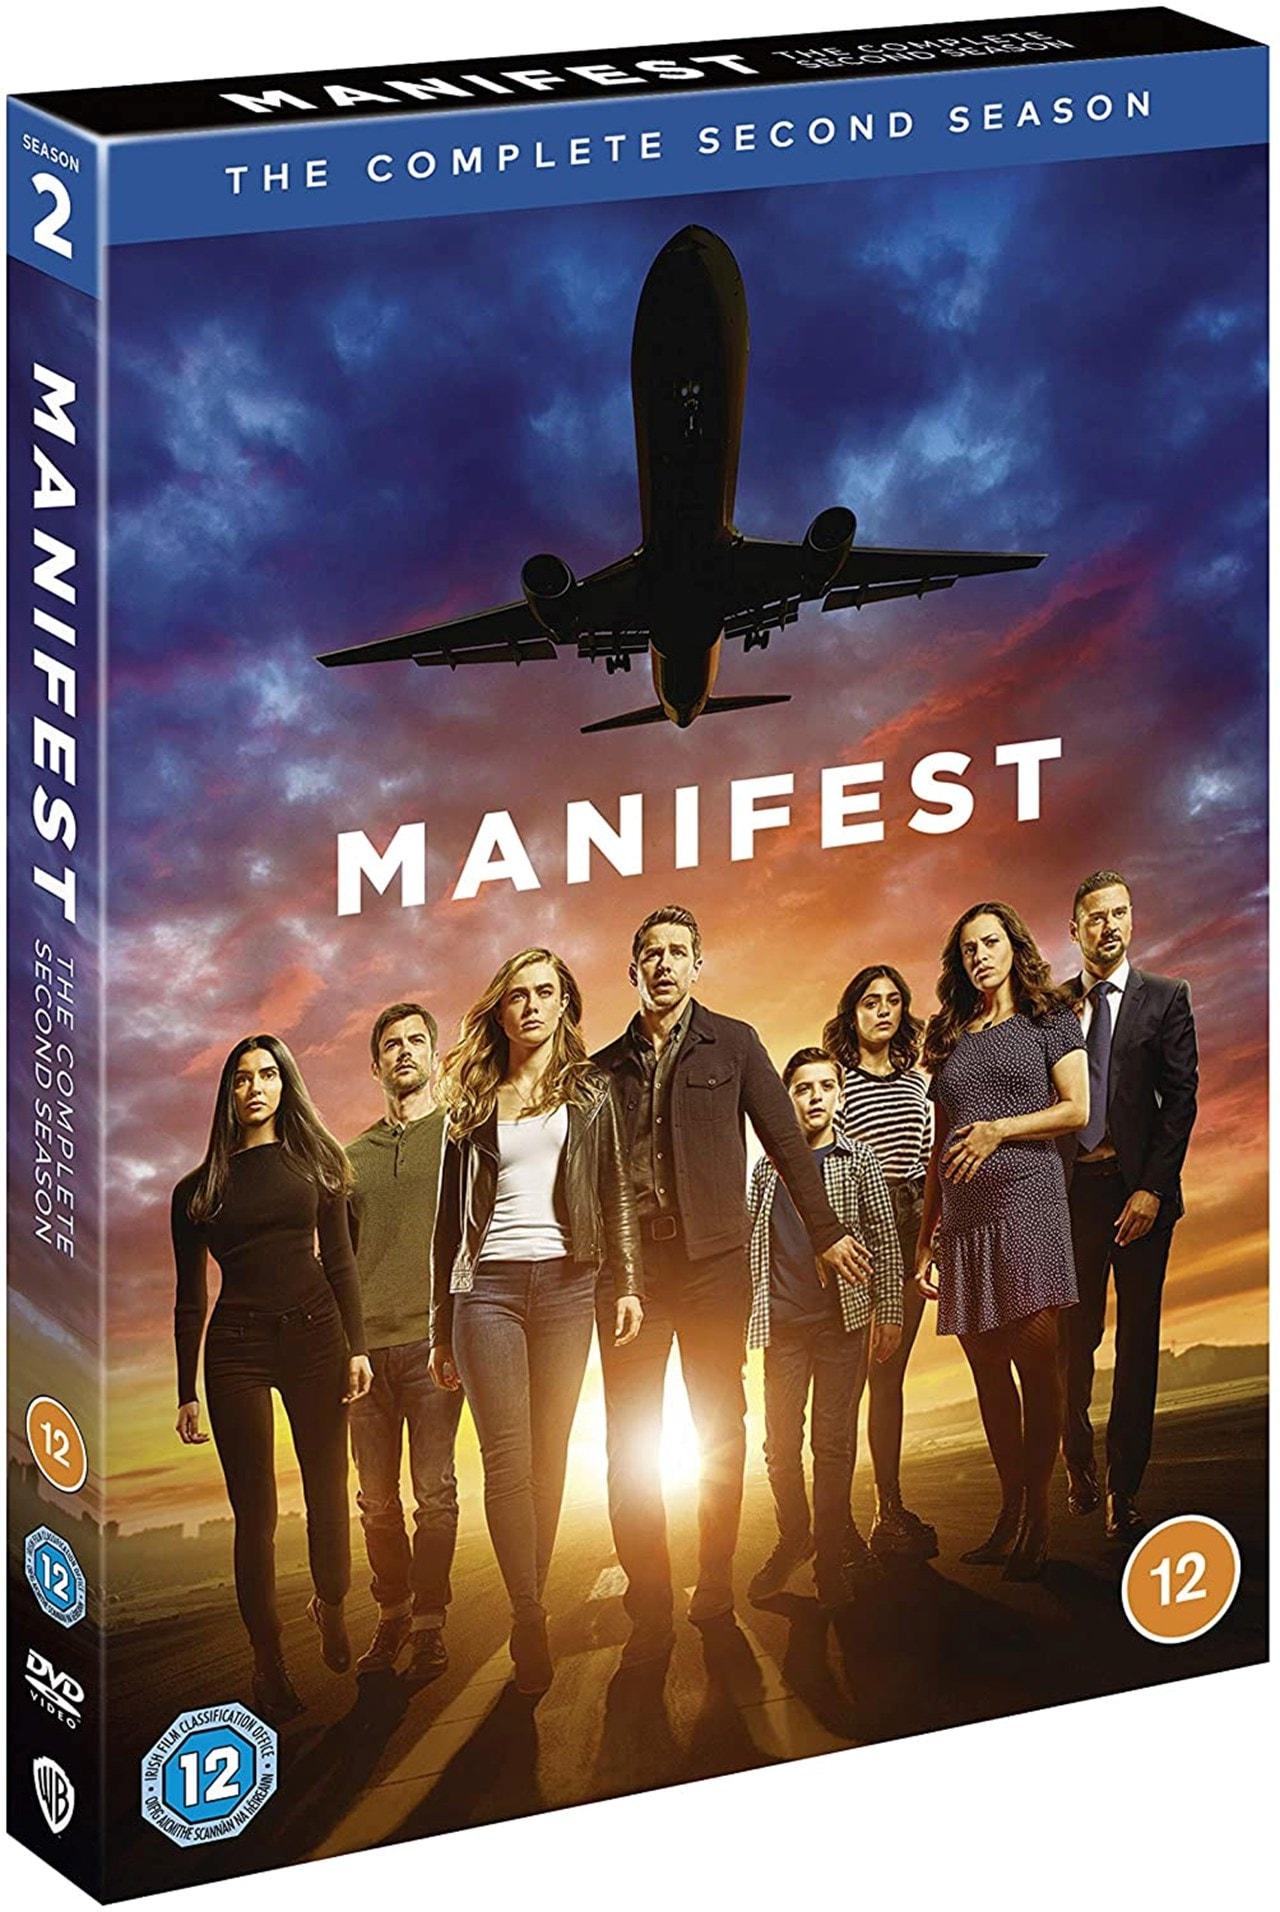 Manifest: The Complete Second Season - 2